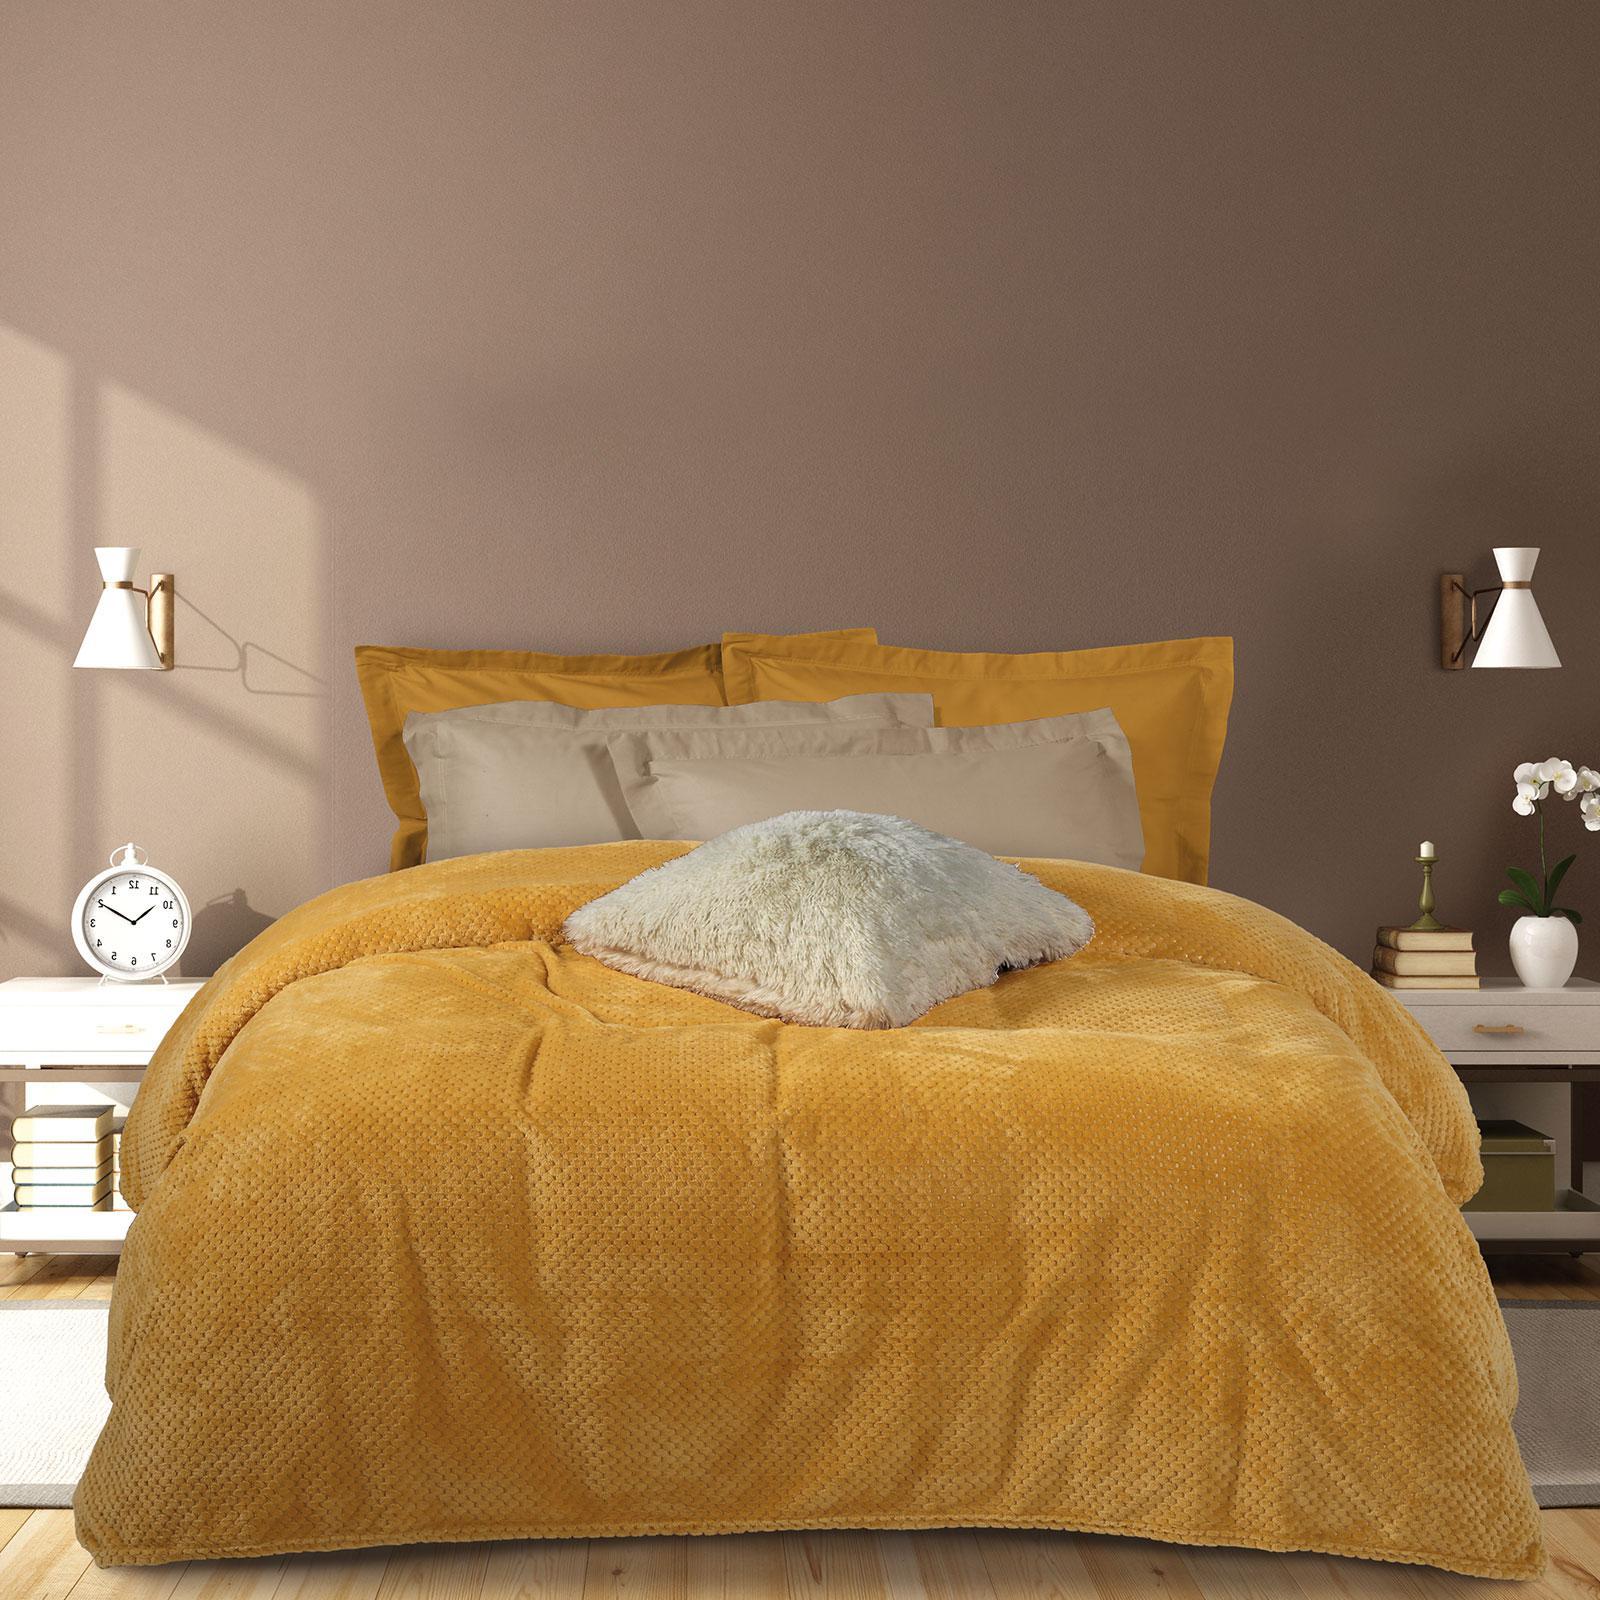 Das Home Κουβερτα Fleece 160Χ220 0466 Ωχρα